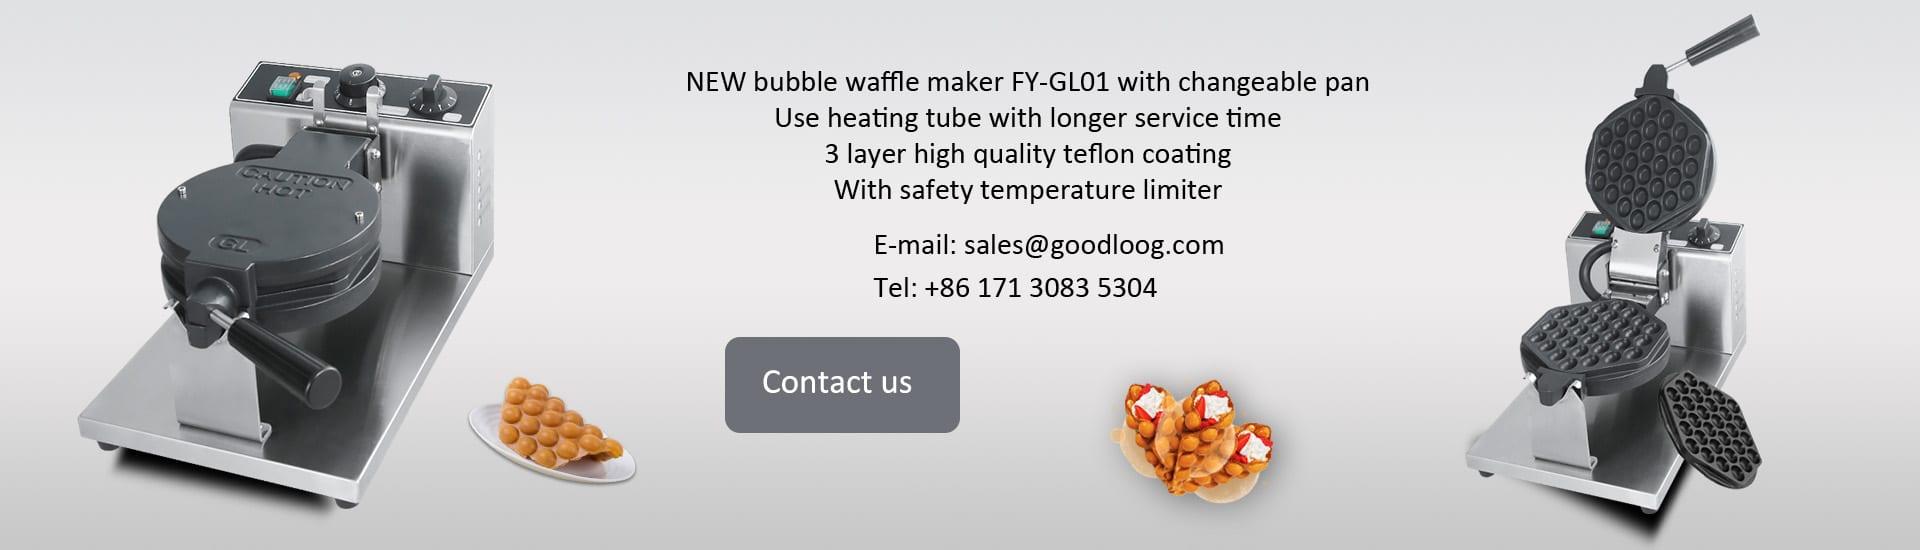 Bubble waffle maker manufacturer